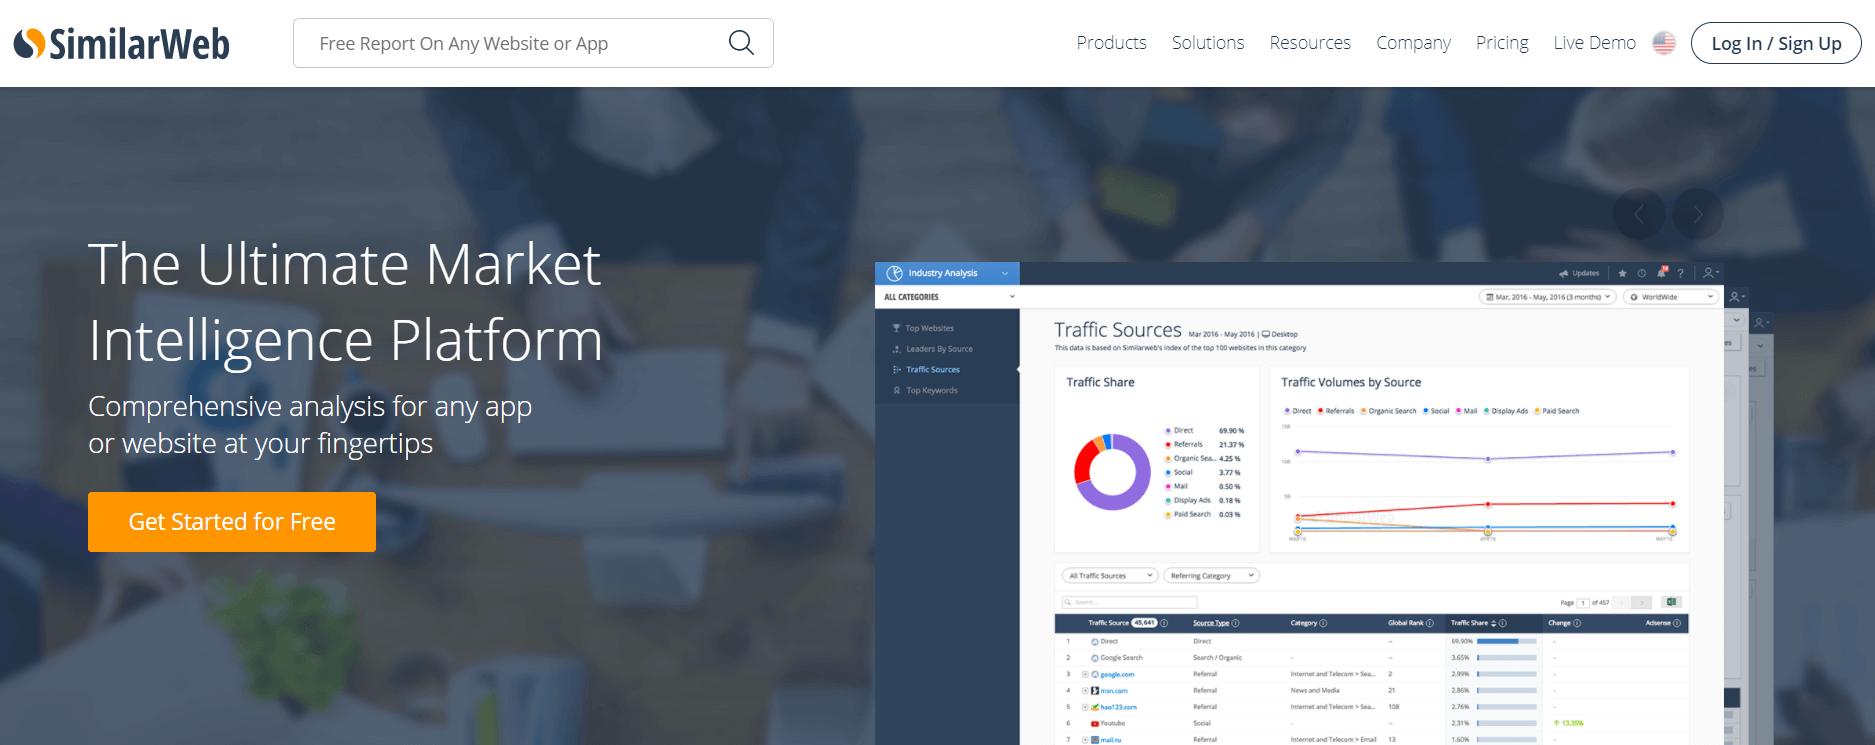 Онлайн-сервис SimilarWeb